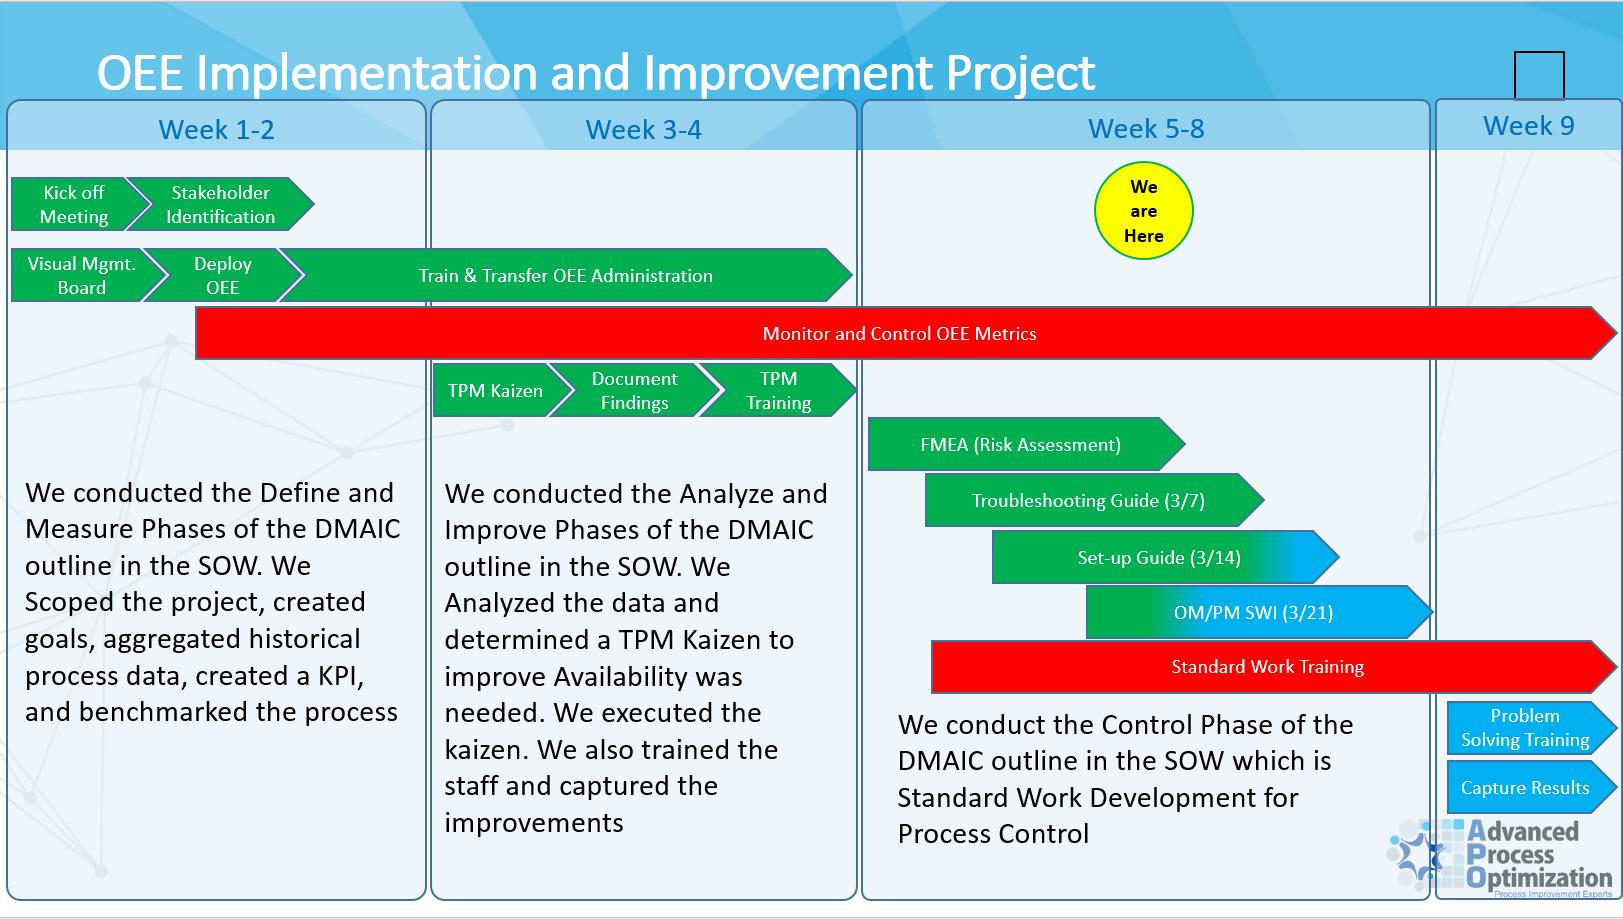 smed template - download gantt chart for 5s implementation gantt chart